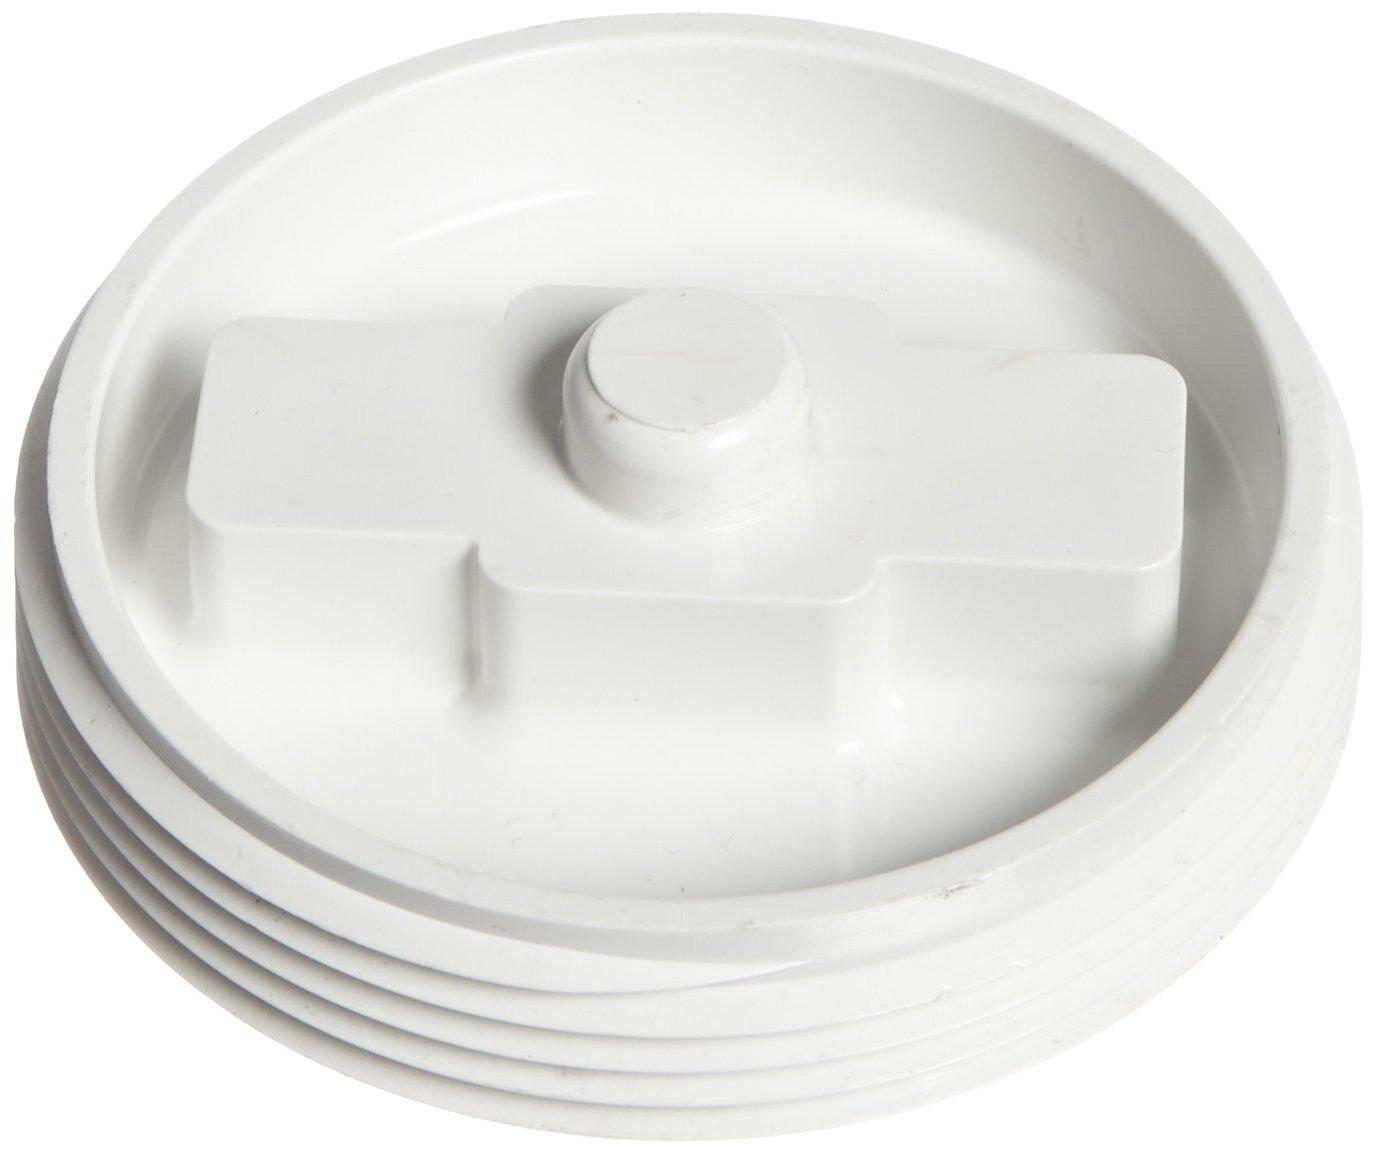 1-1//2 NPT Male Flush Plug Spears P110 Series PVC DWV Pipe Fitting